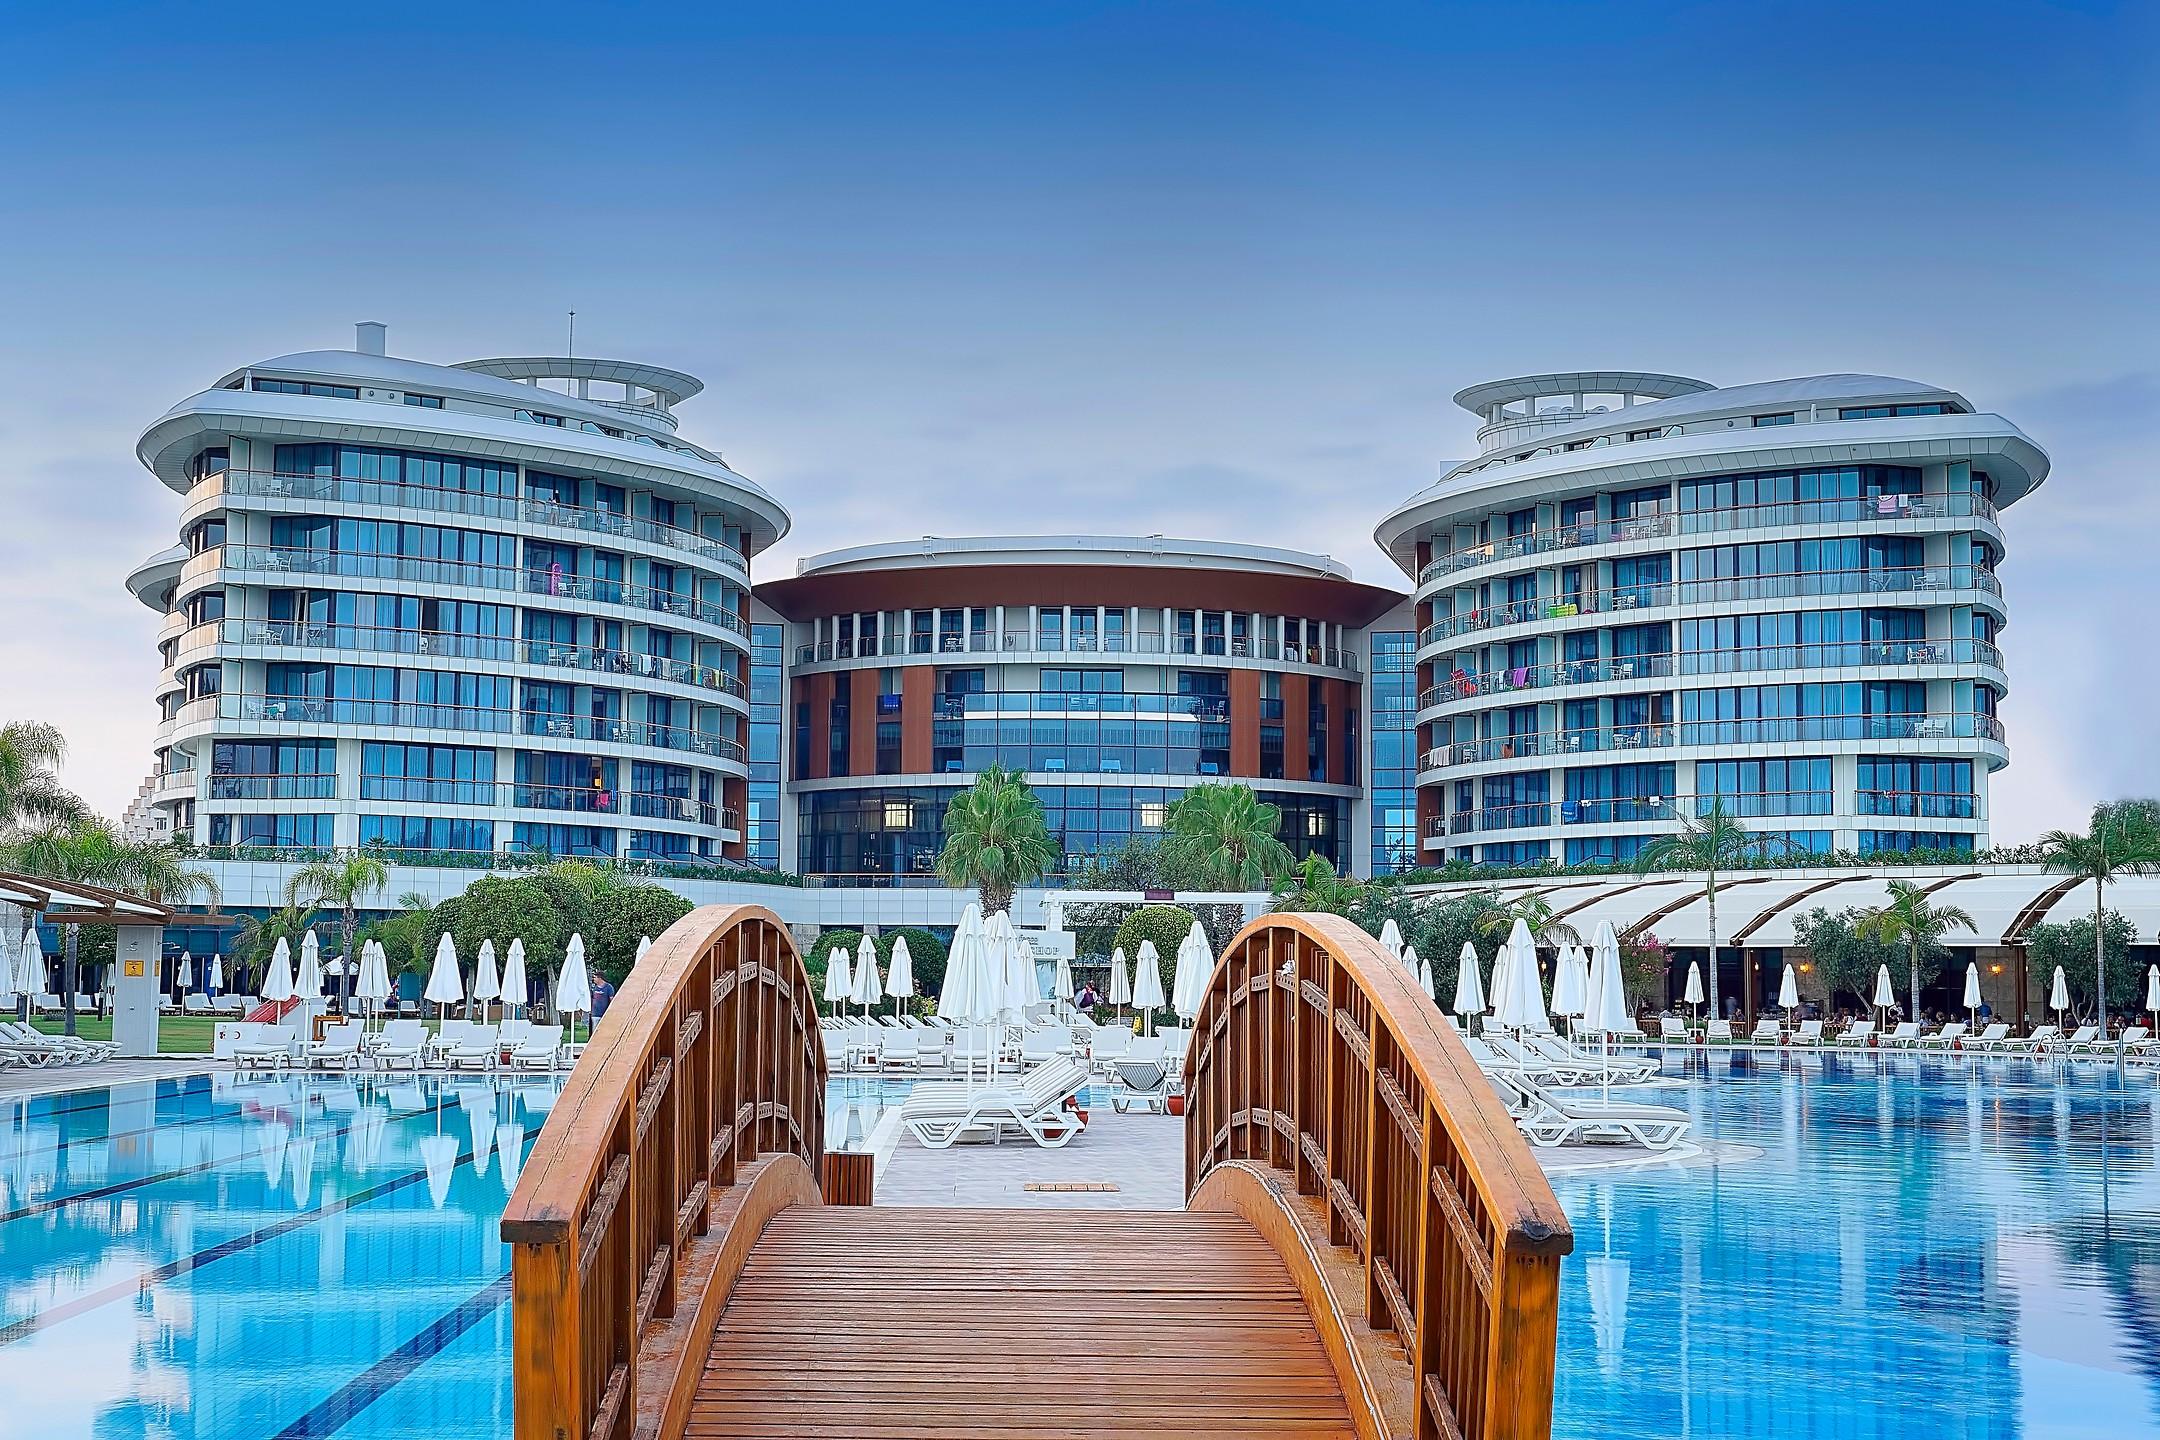 Hotel-Baia-Lara-Genel-119653